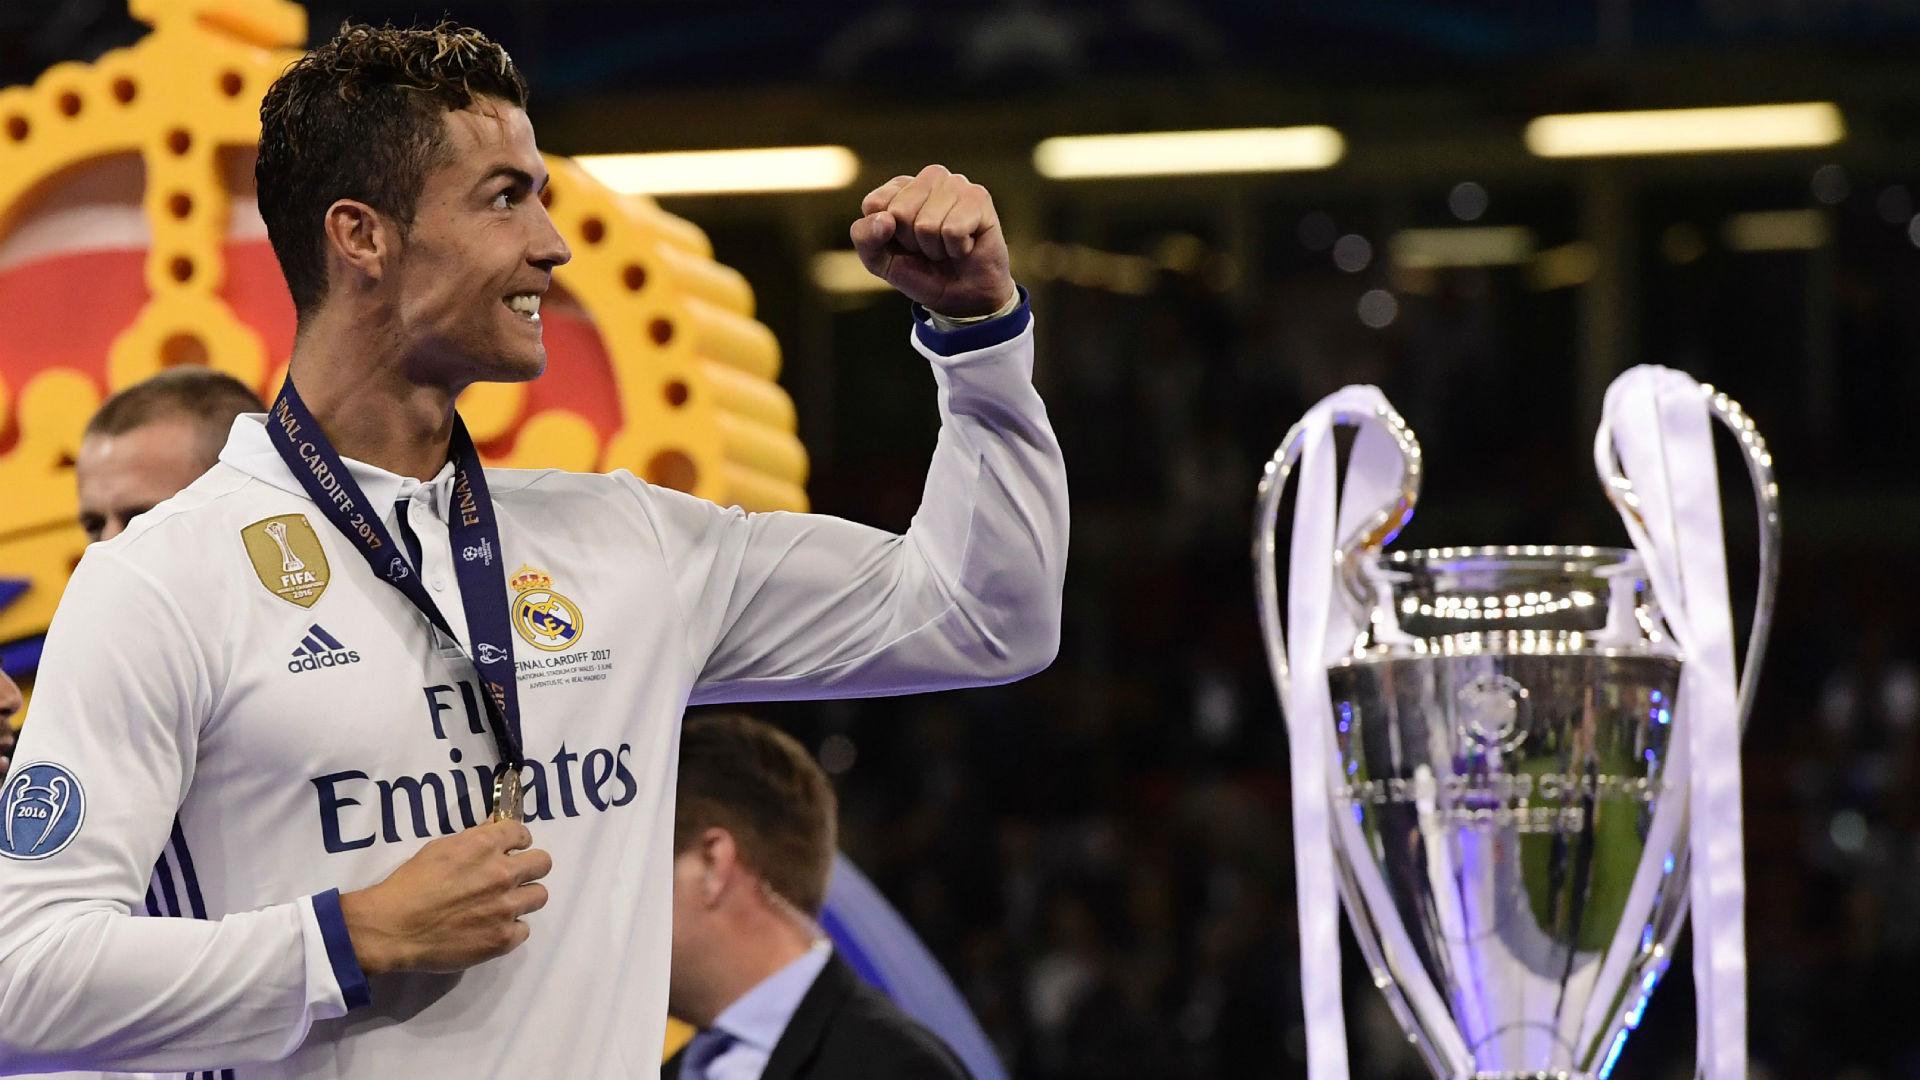 Cristiano Ronaldo Campeón de la Champions League